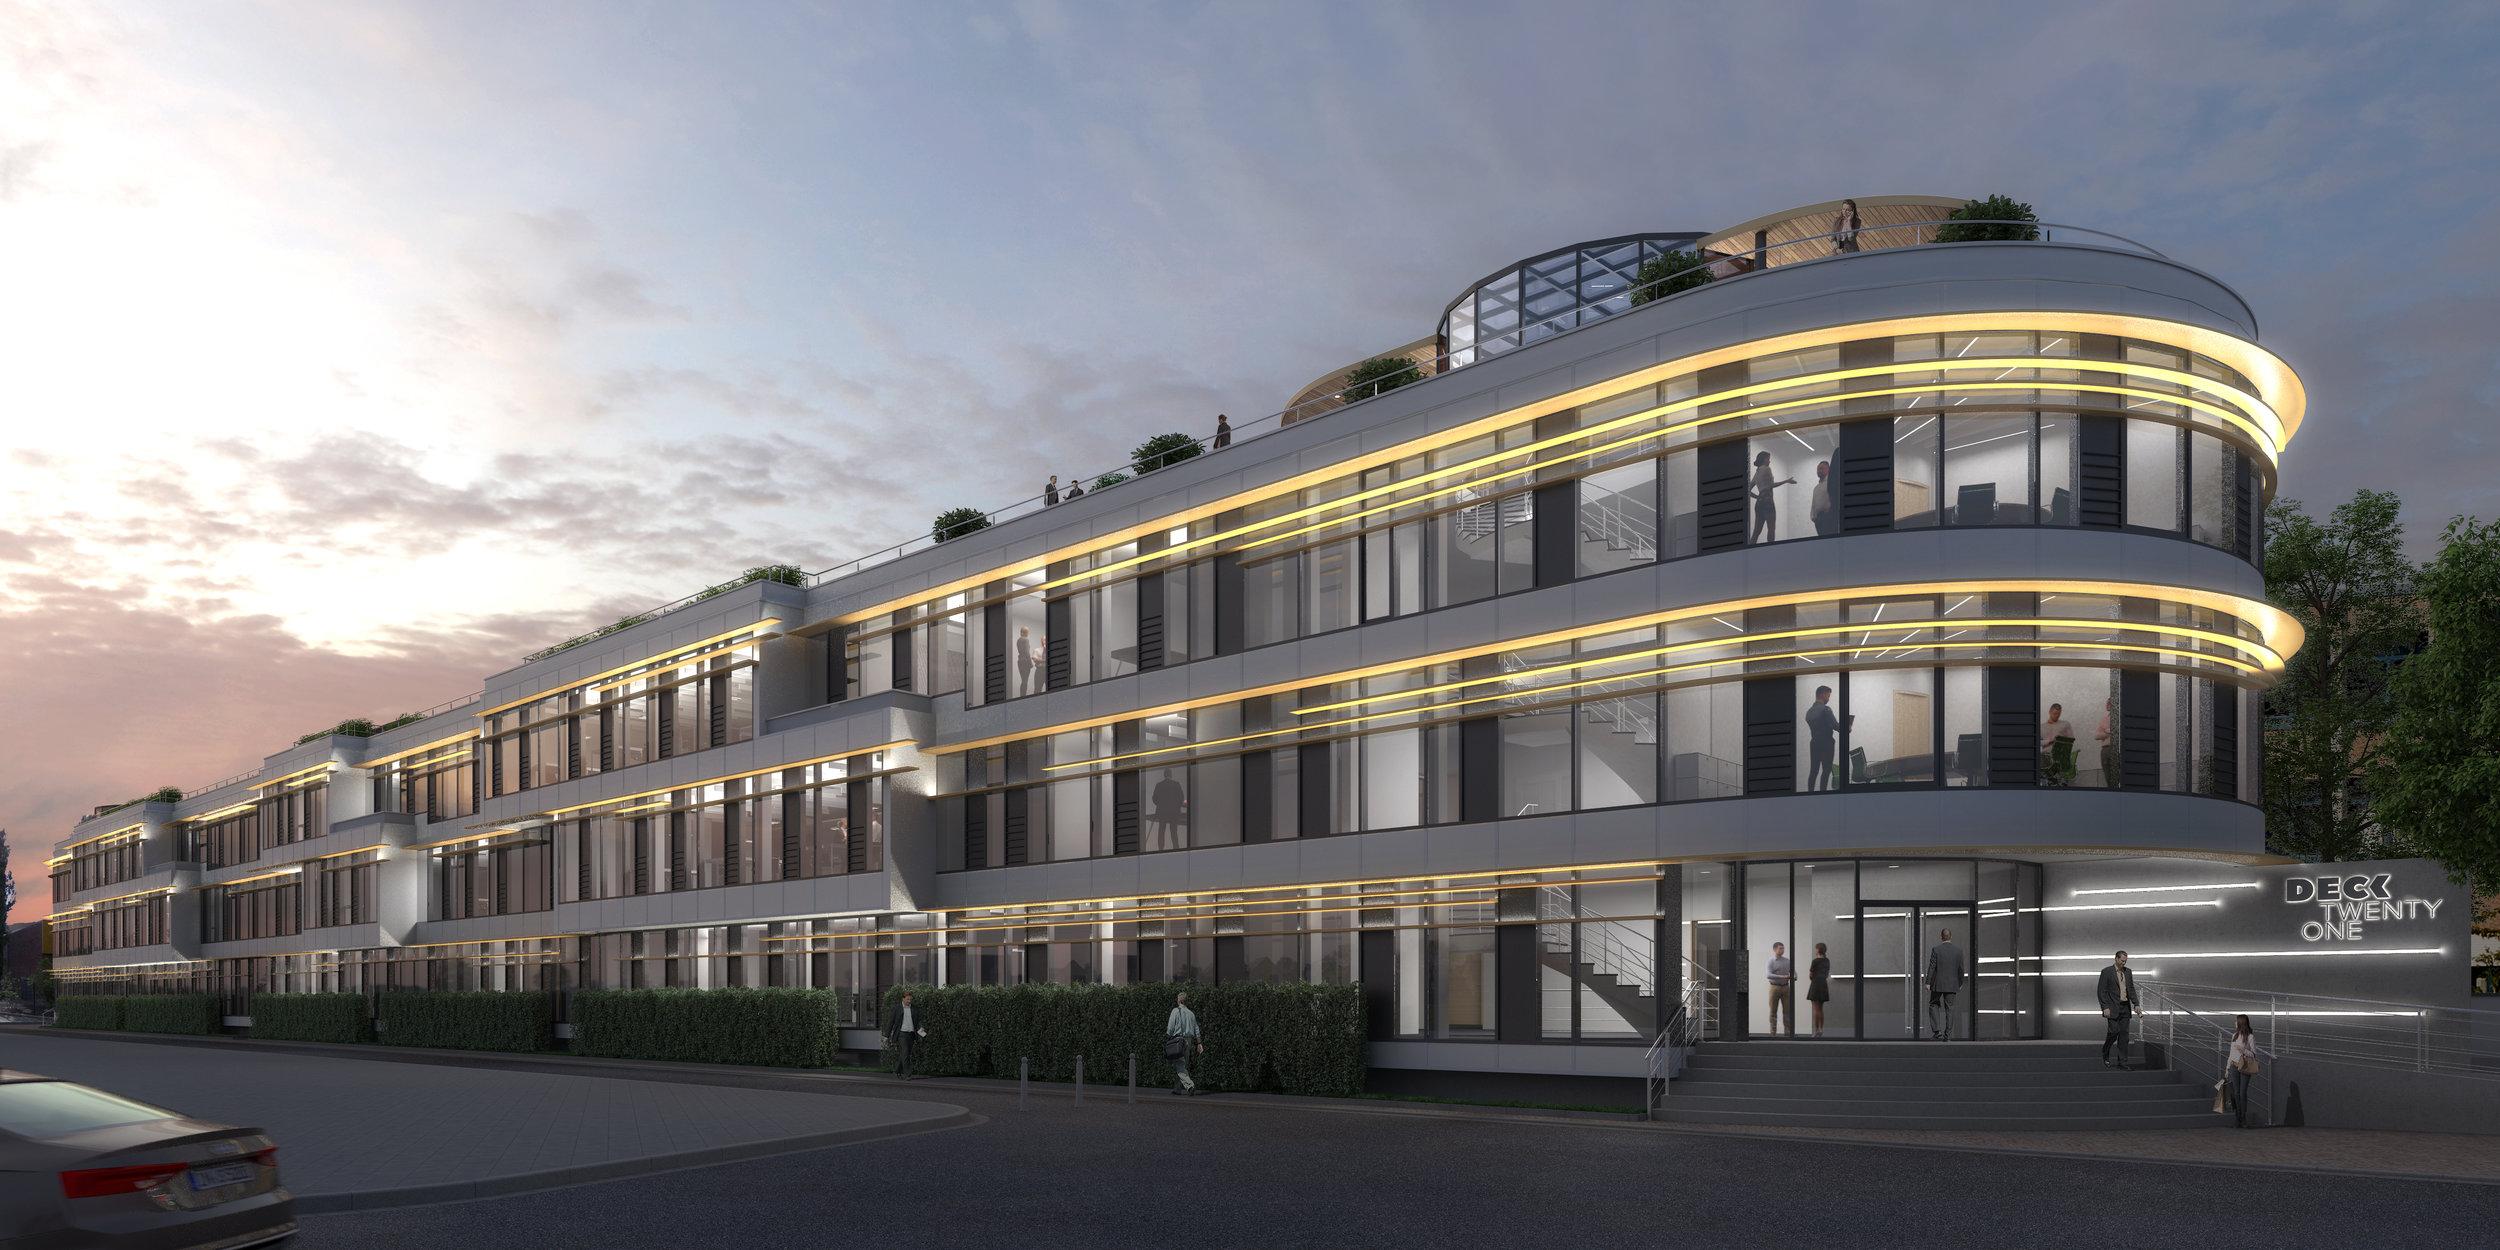 Deilmann_Bürogebäude_Düsseldorf_Cam01_Osteingang_Nacht_2_Finisch02.jpg